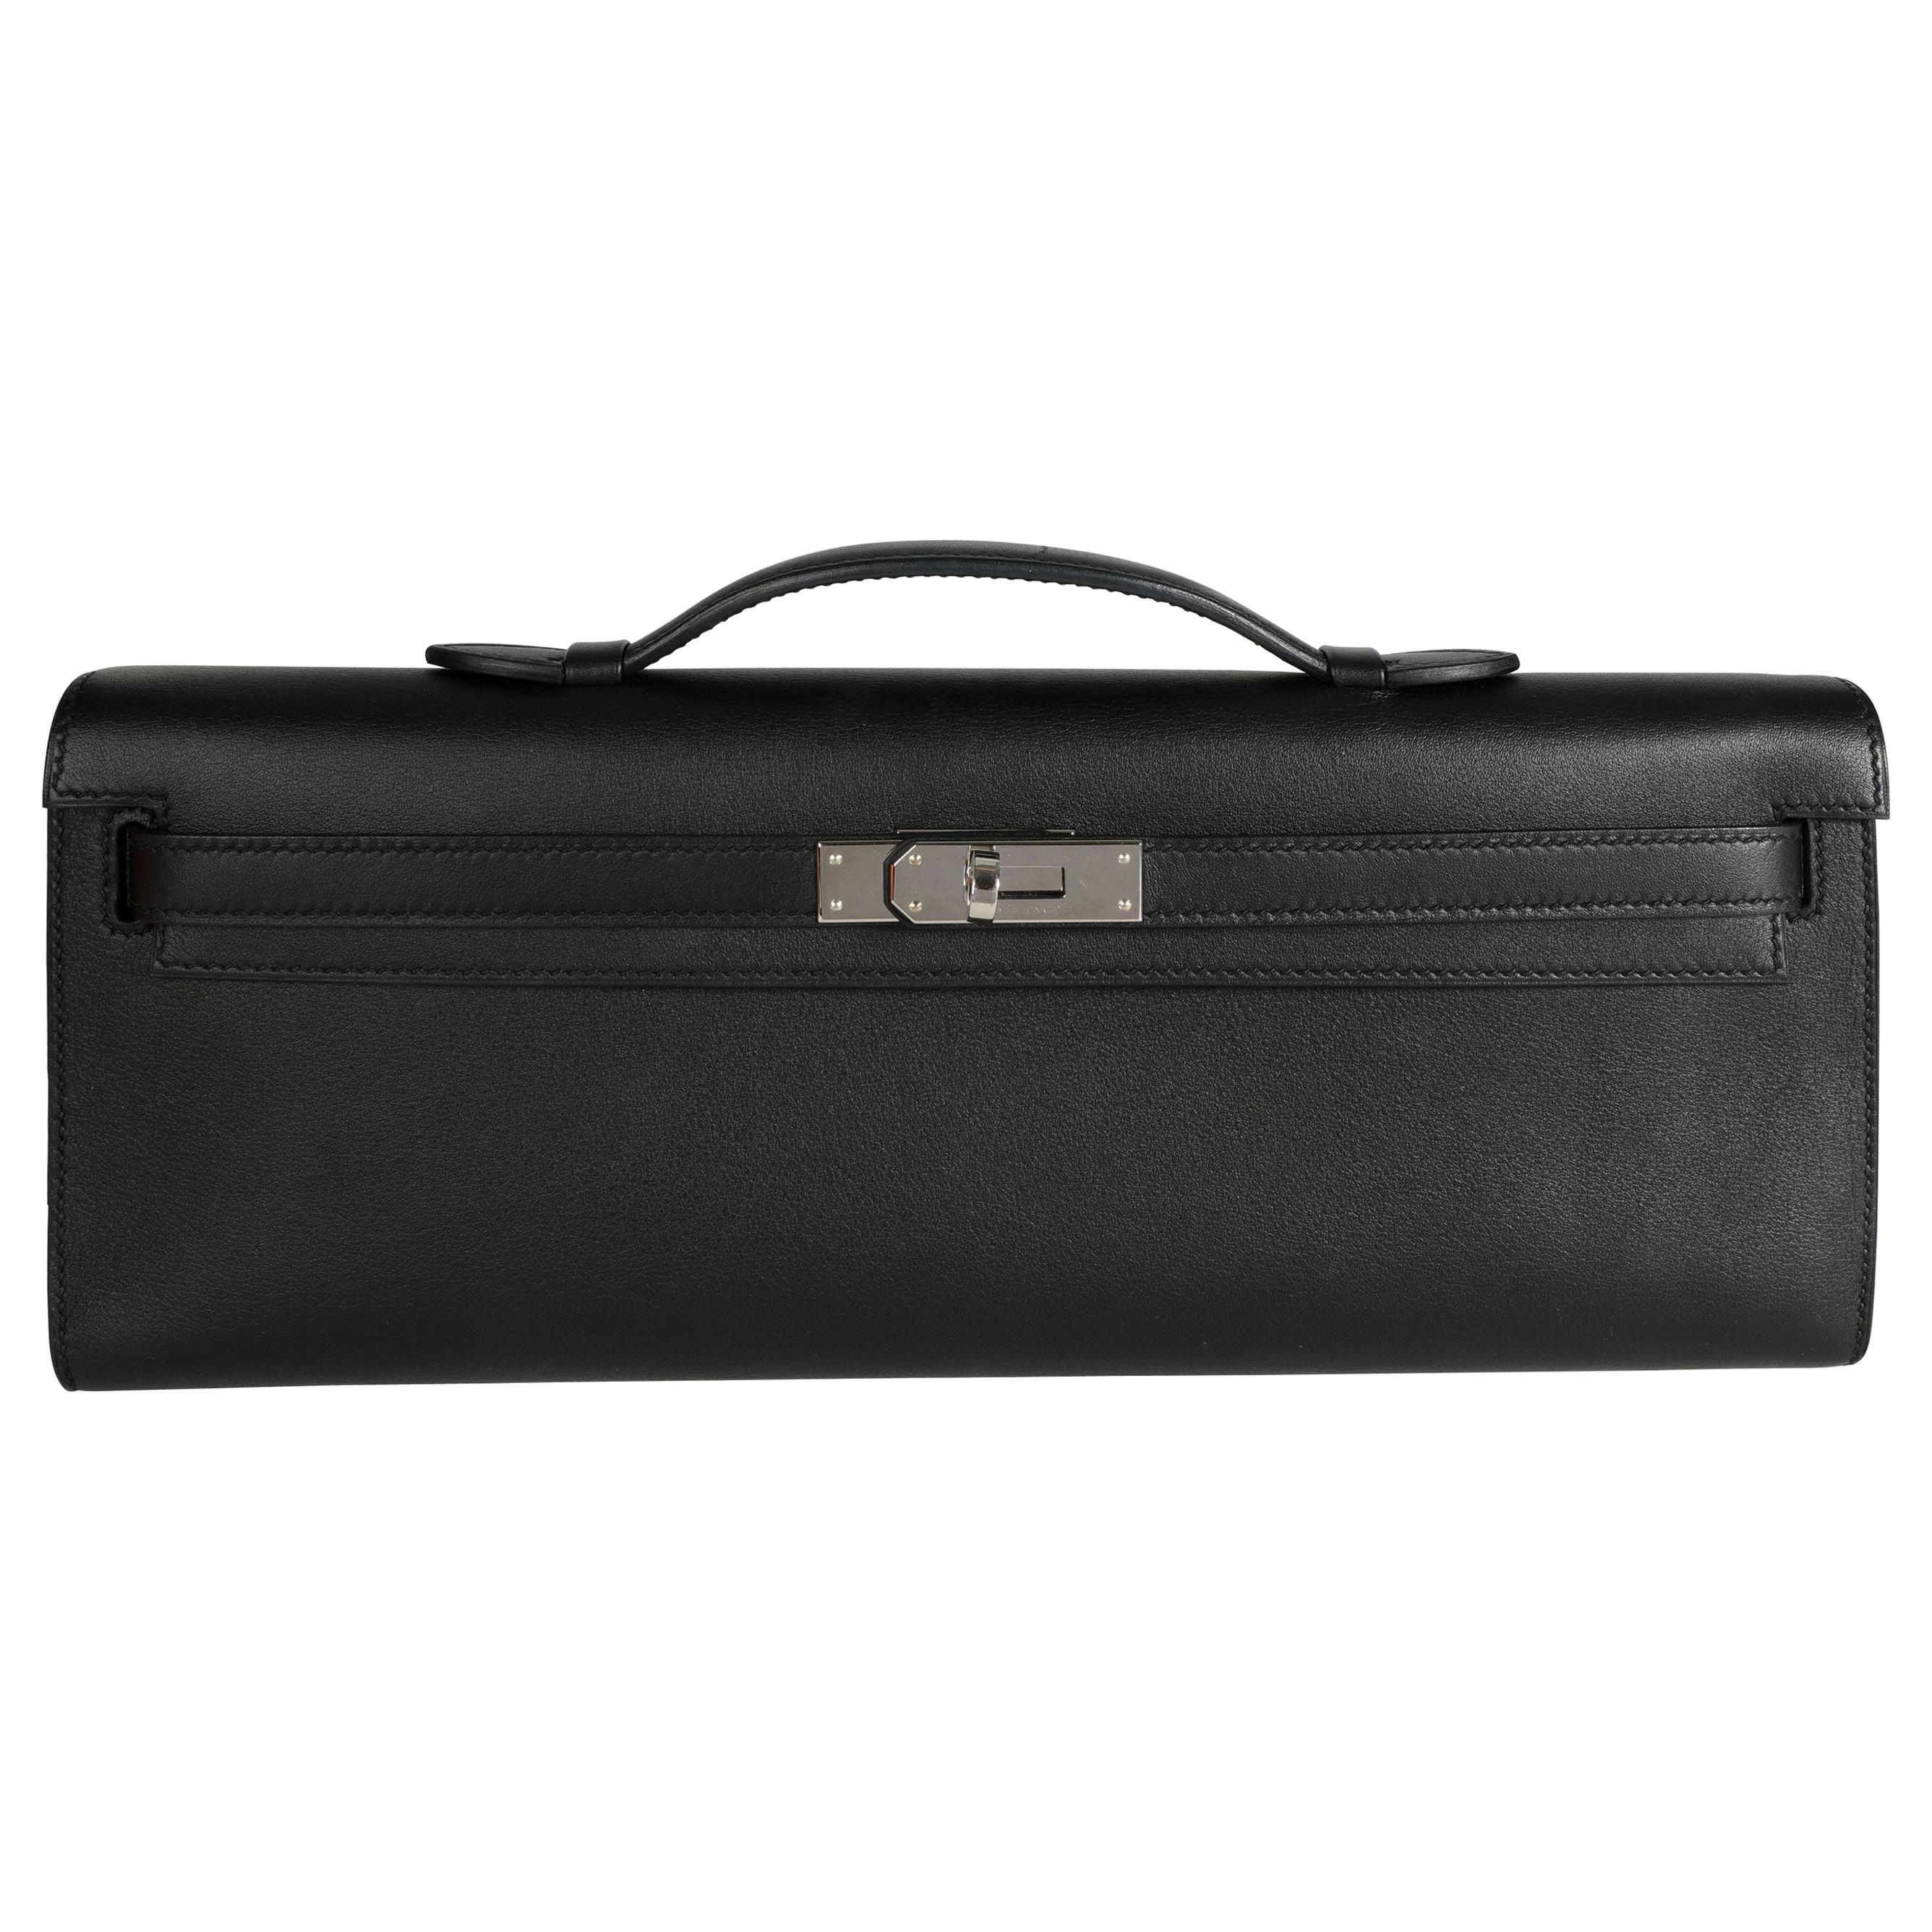 Hermès Black Swift Leather Kelly Cut PHW